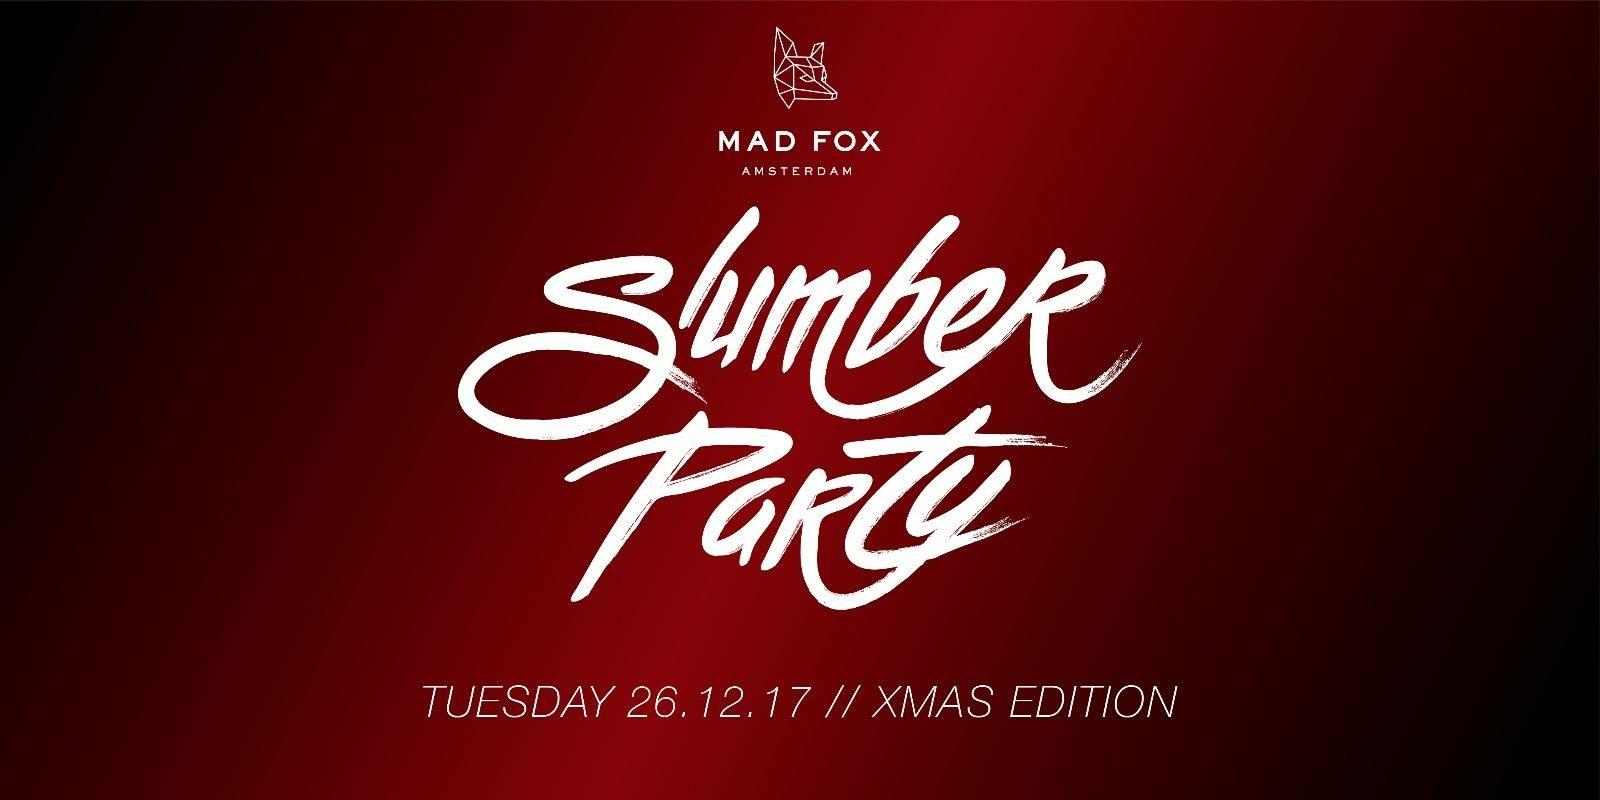 XMAS Slumberparty 26 December 2017 Mad Fox Amsterdam Event